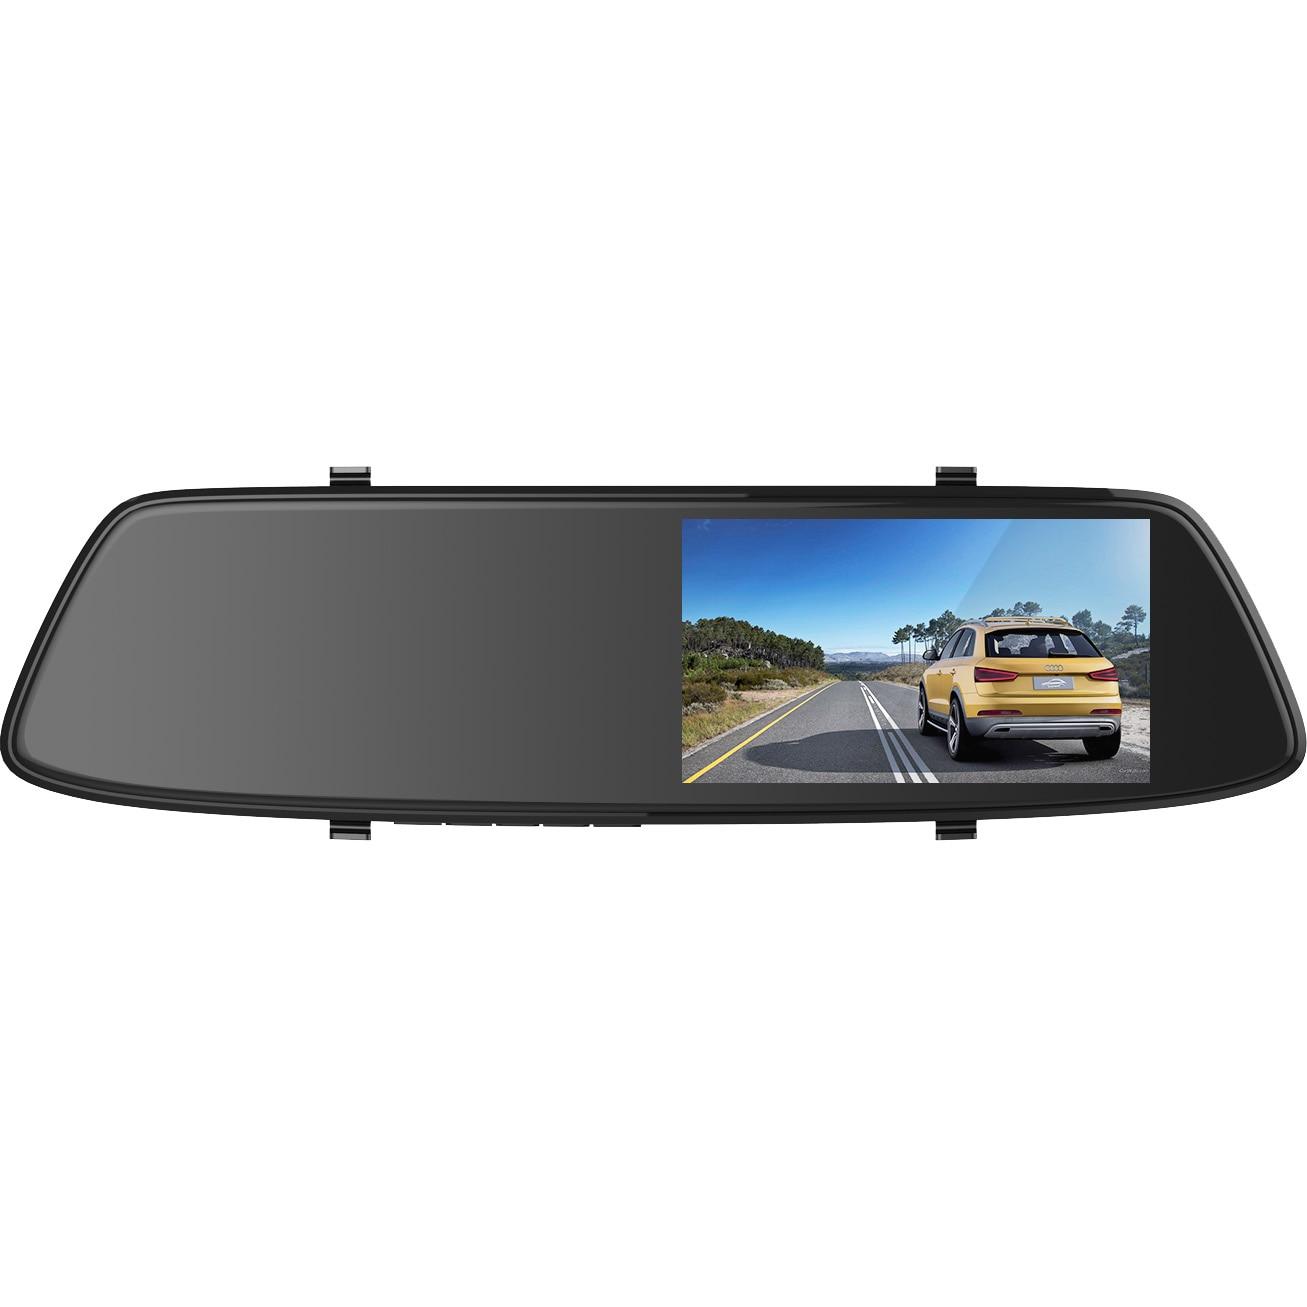 Fotografie Oglinda Auto DVR 2Drive, camera fata-spate FHD 1080p, 5'' display